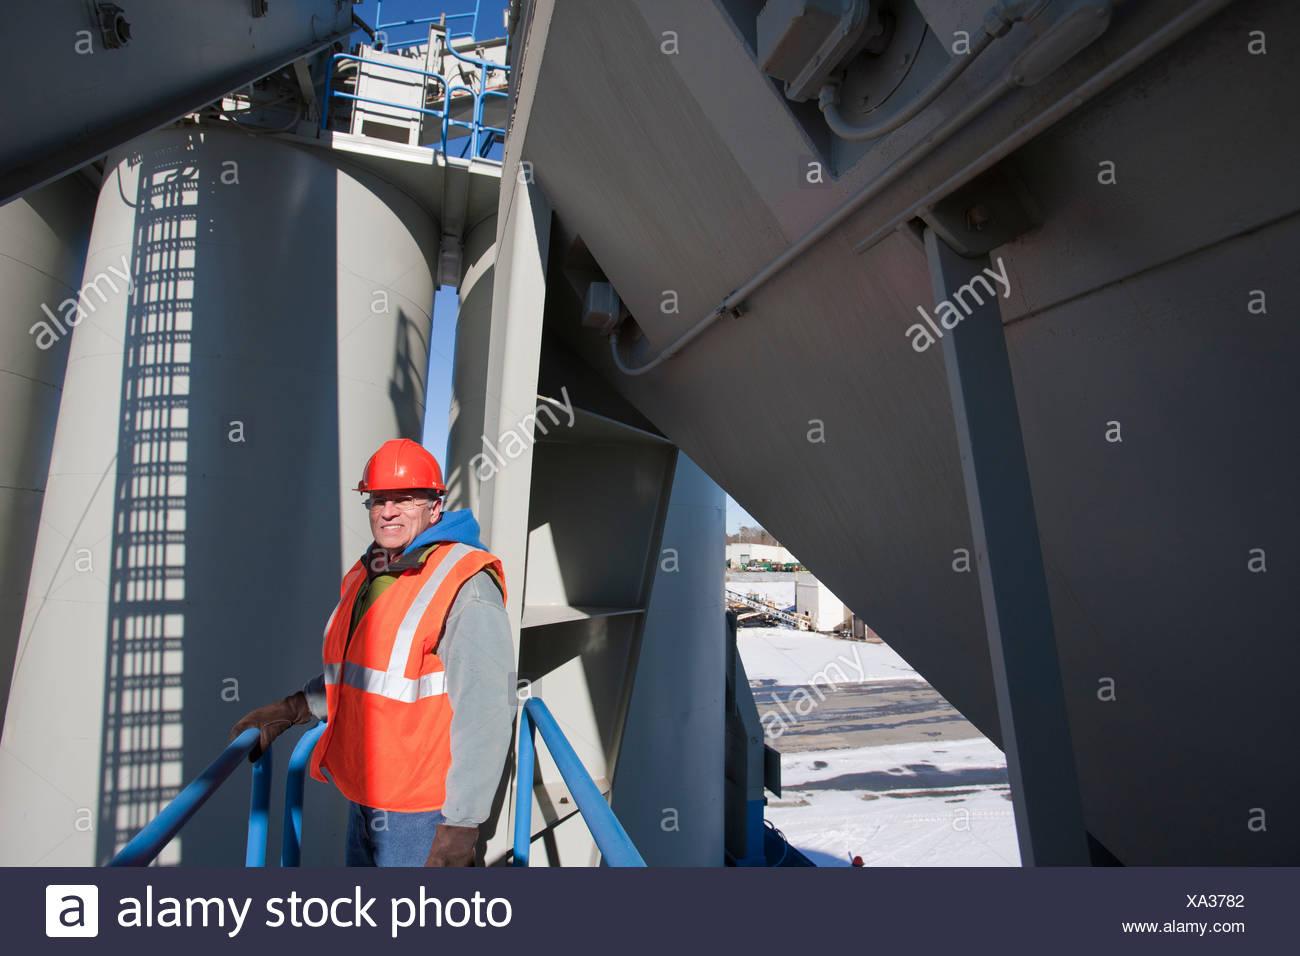 Engineer standing on inspection platform - Stock Image